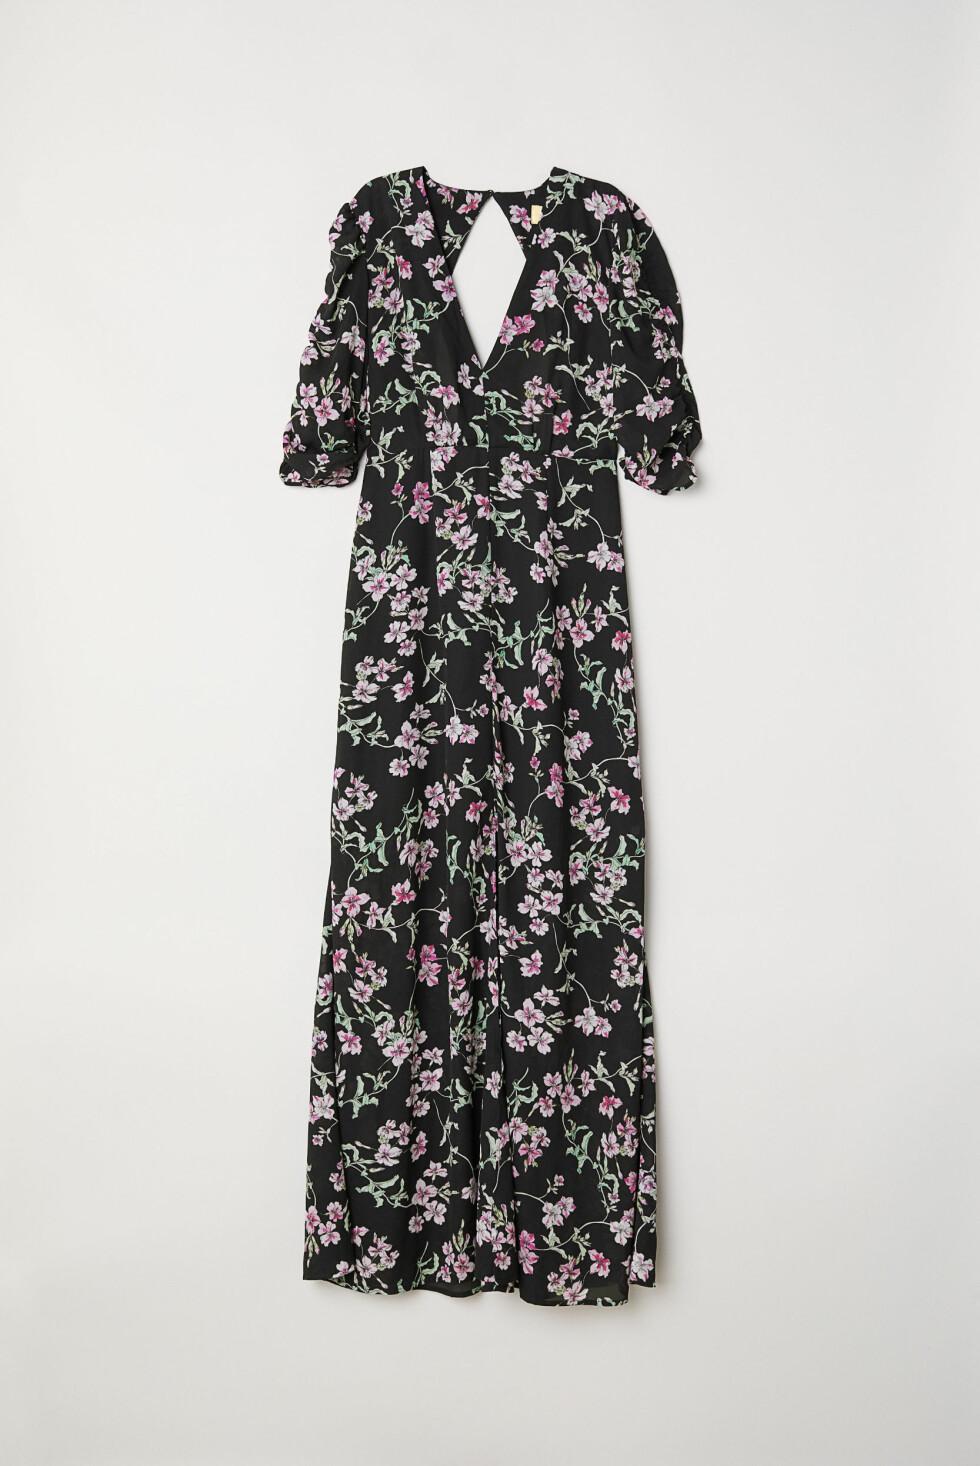 Kjole fra H&M  400,-  http://www2.hm.com/no_no/productpage.0619207001.html